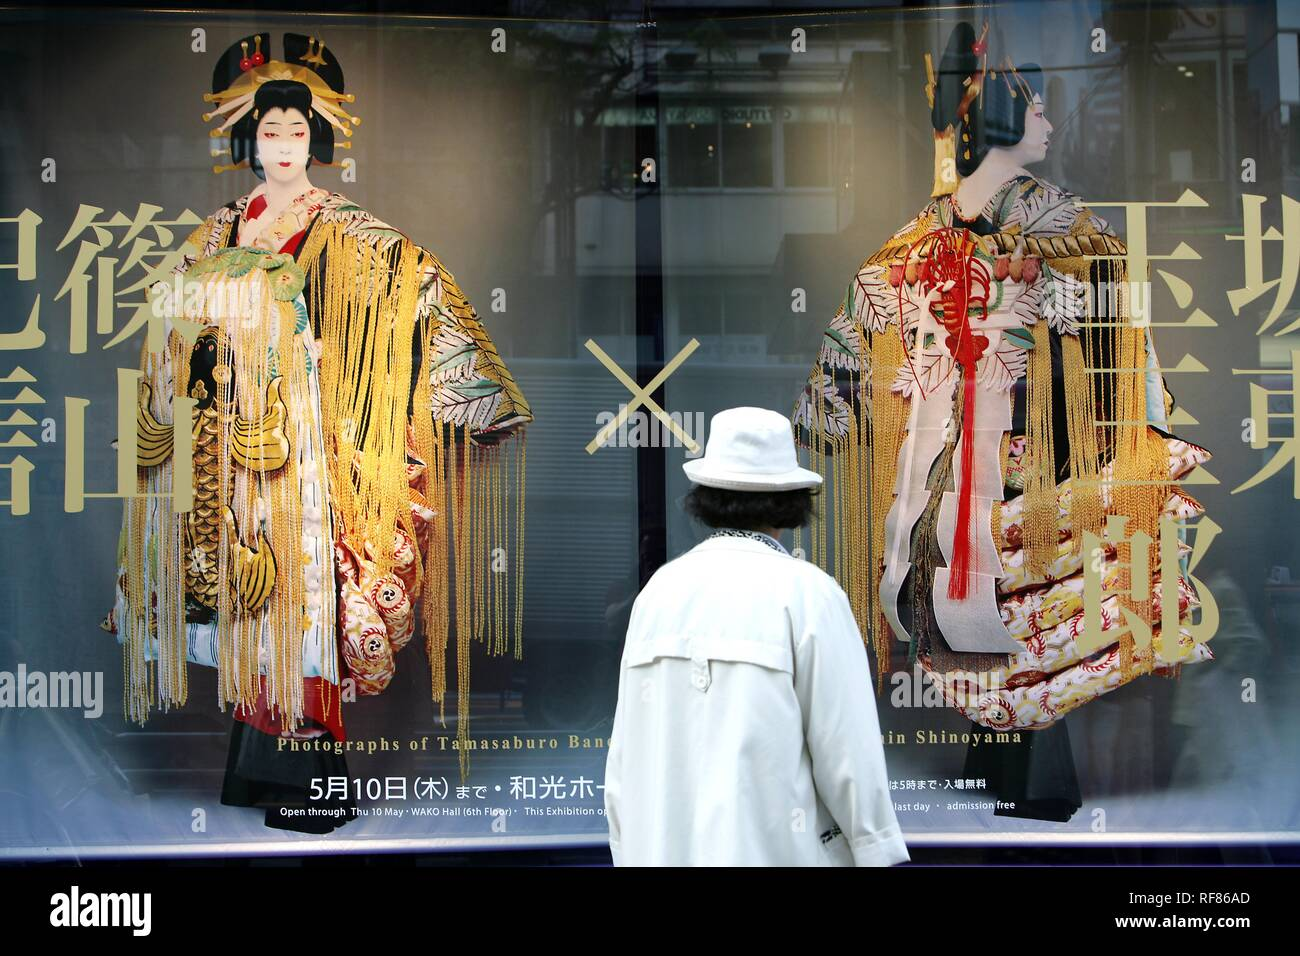 Ginza elegant shopping and entertainments district Wako juweller Harumi Dori, Tokyo Japan - Stock Image